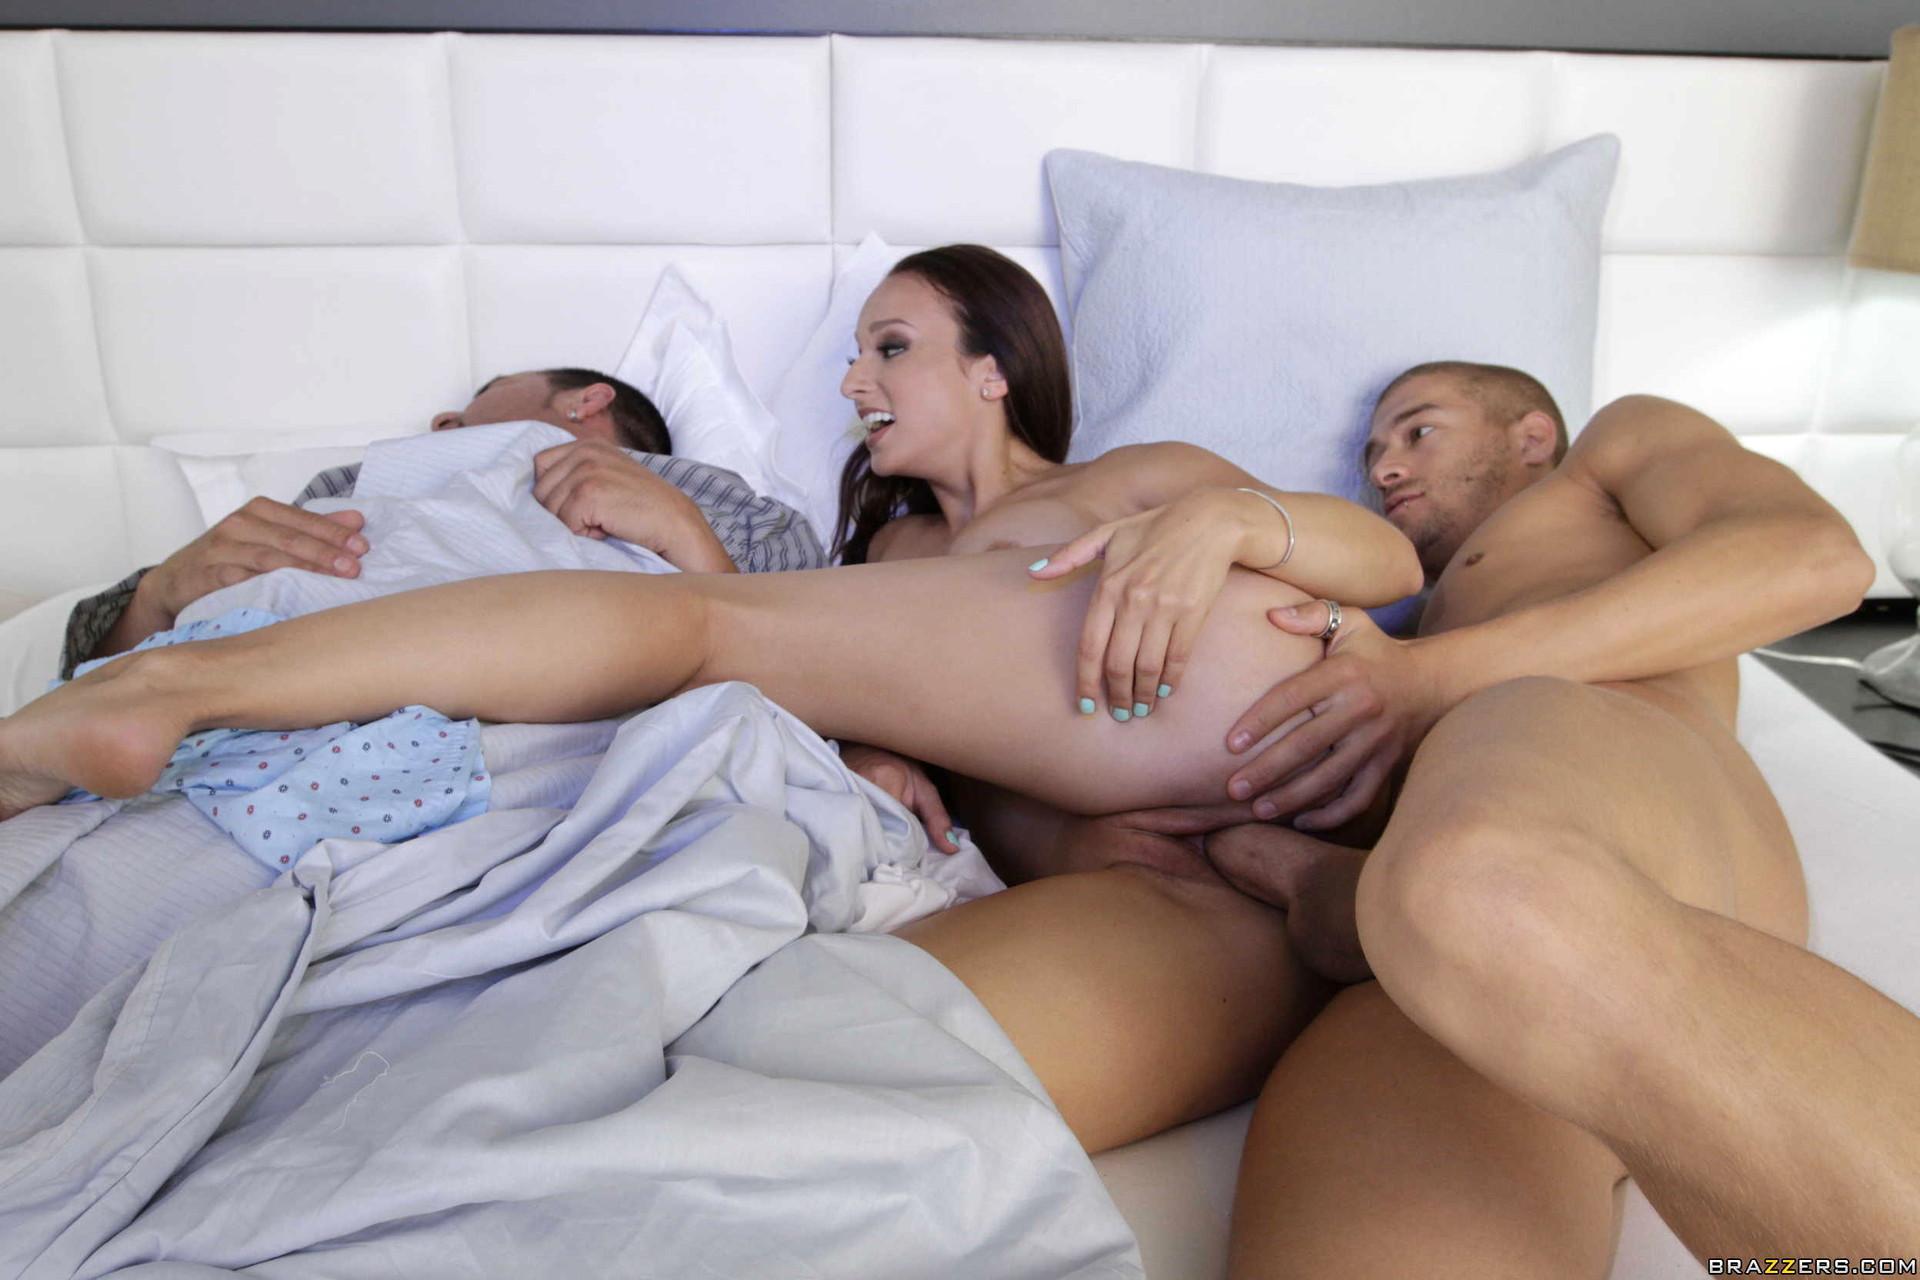 Порно жены дрочат муж спит рядом